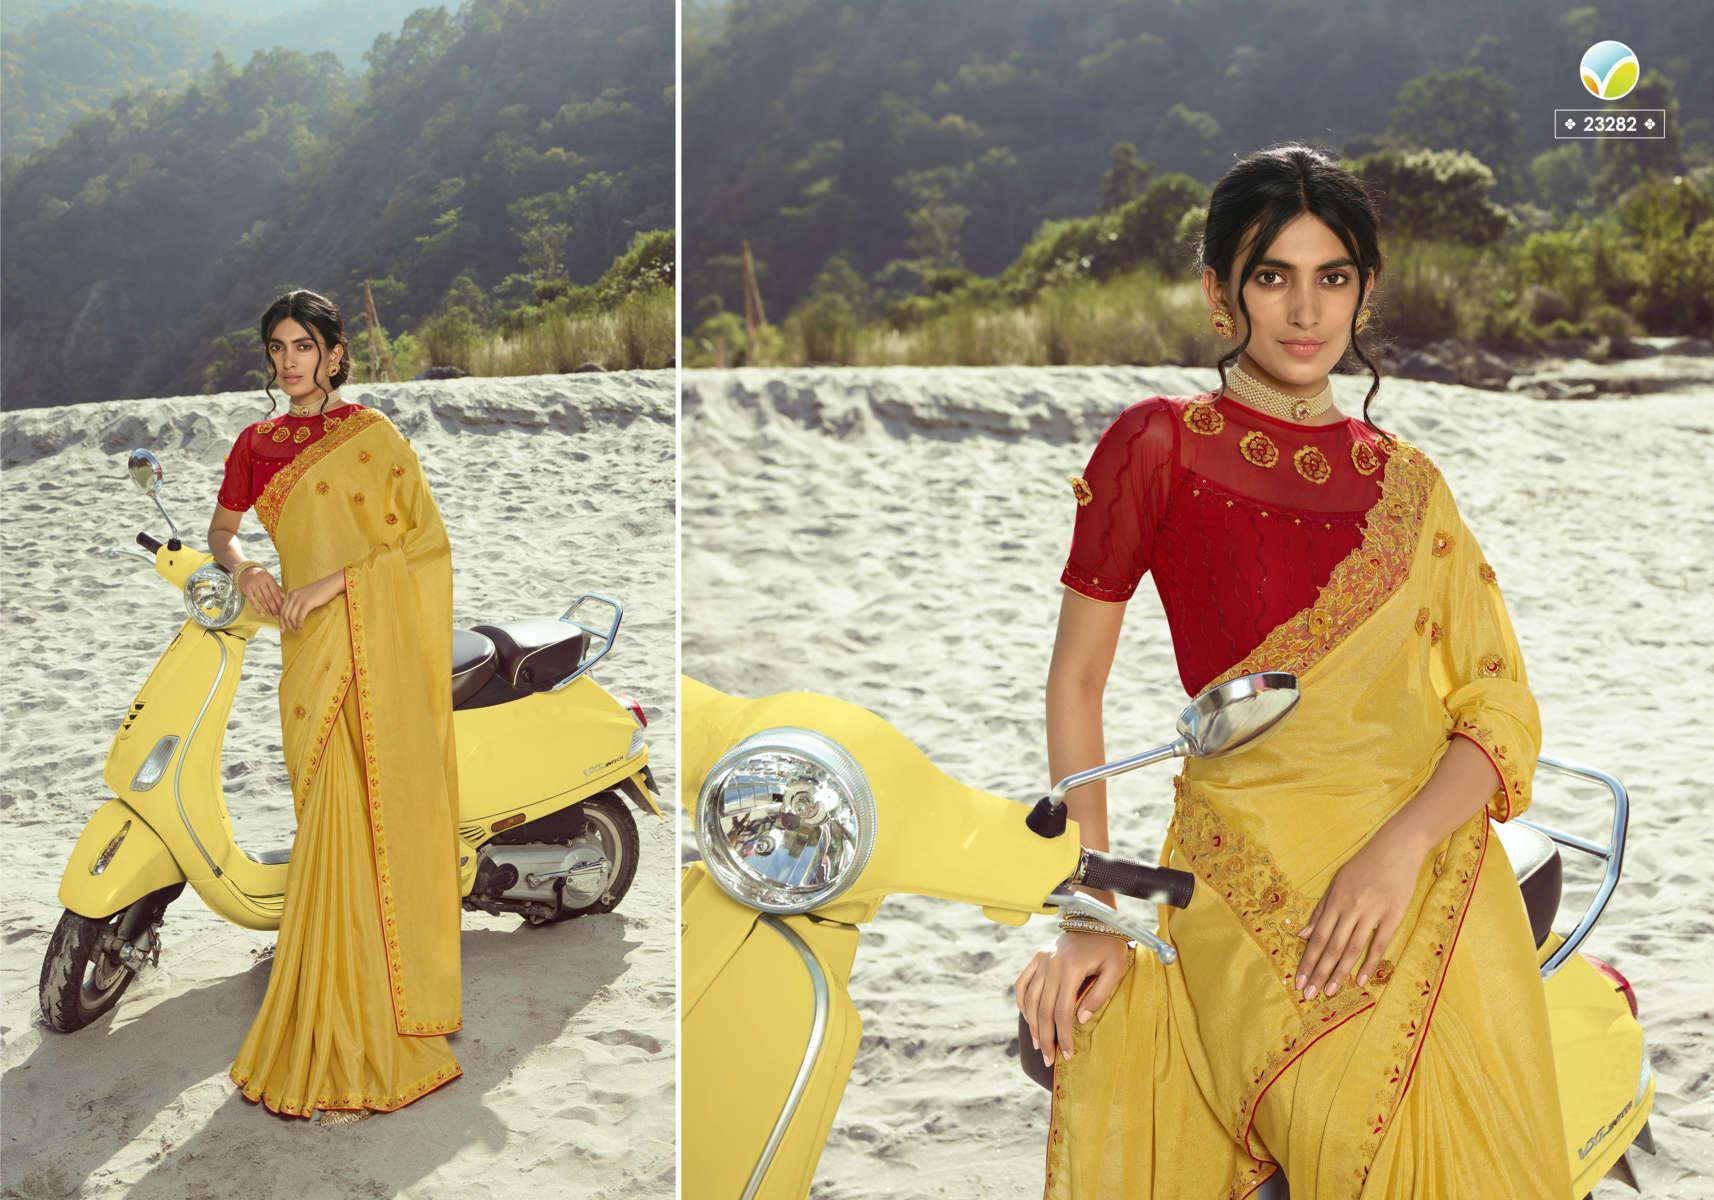 Vinay Sheesha Aafreen Vol 2 Saree Sari Wholesale Catalog 10 Pcs 3 1 - Vinay Sheesha Aafreen Vol 2 Saree Sari Wholesale Catalog 10 Pcs